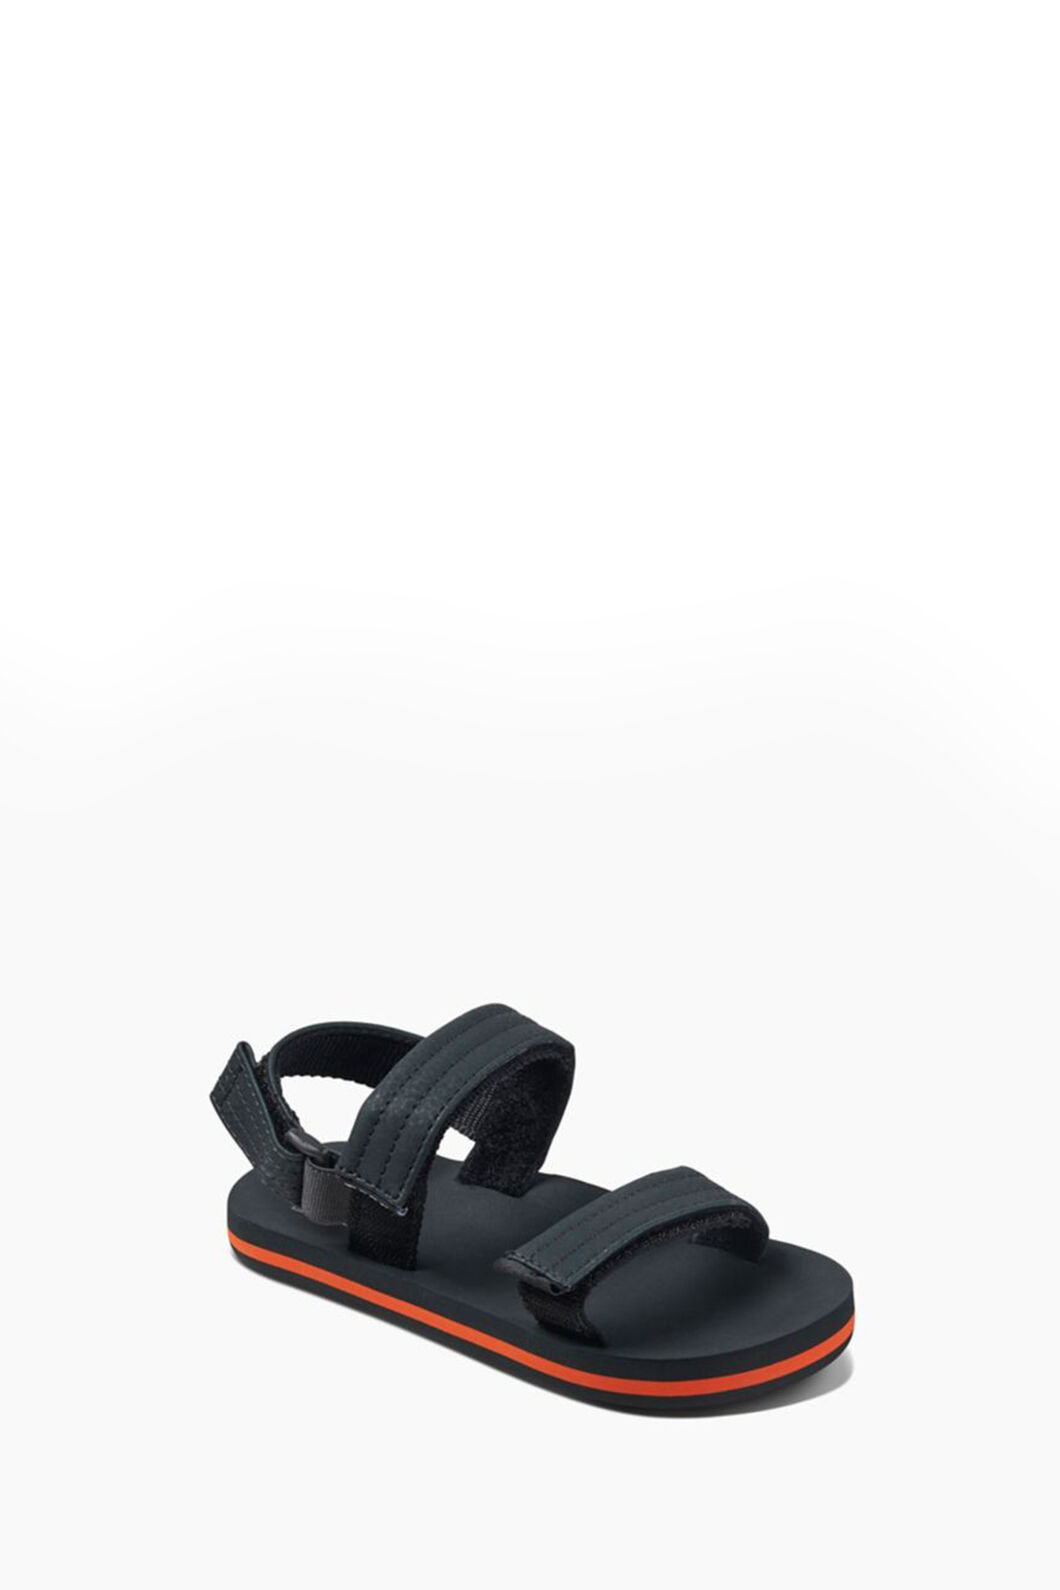 Reef Little Ahi Convertible Sandals — Kids', Grey Orange, hi-res